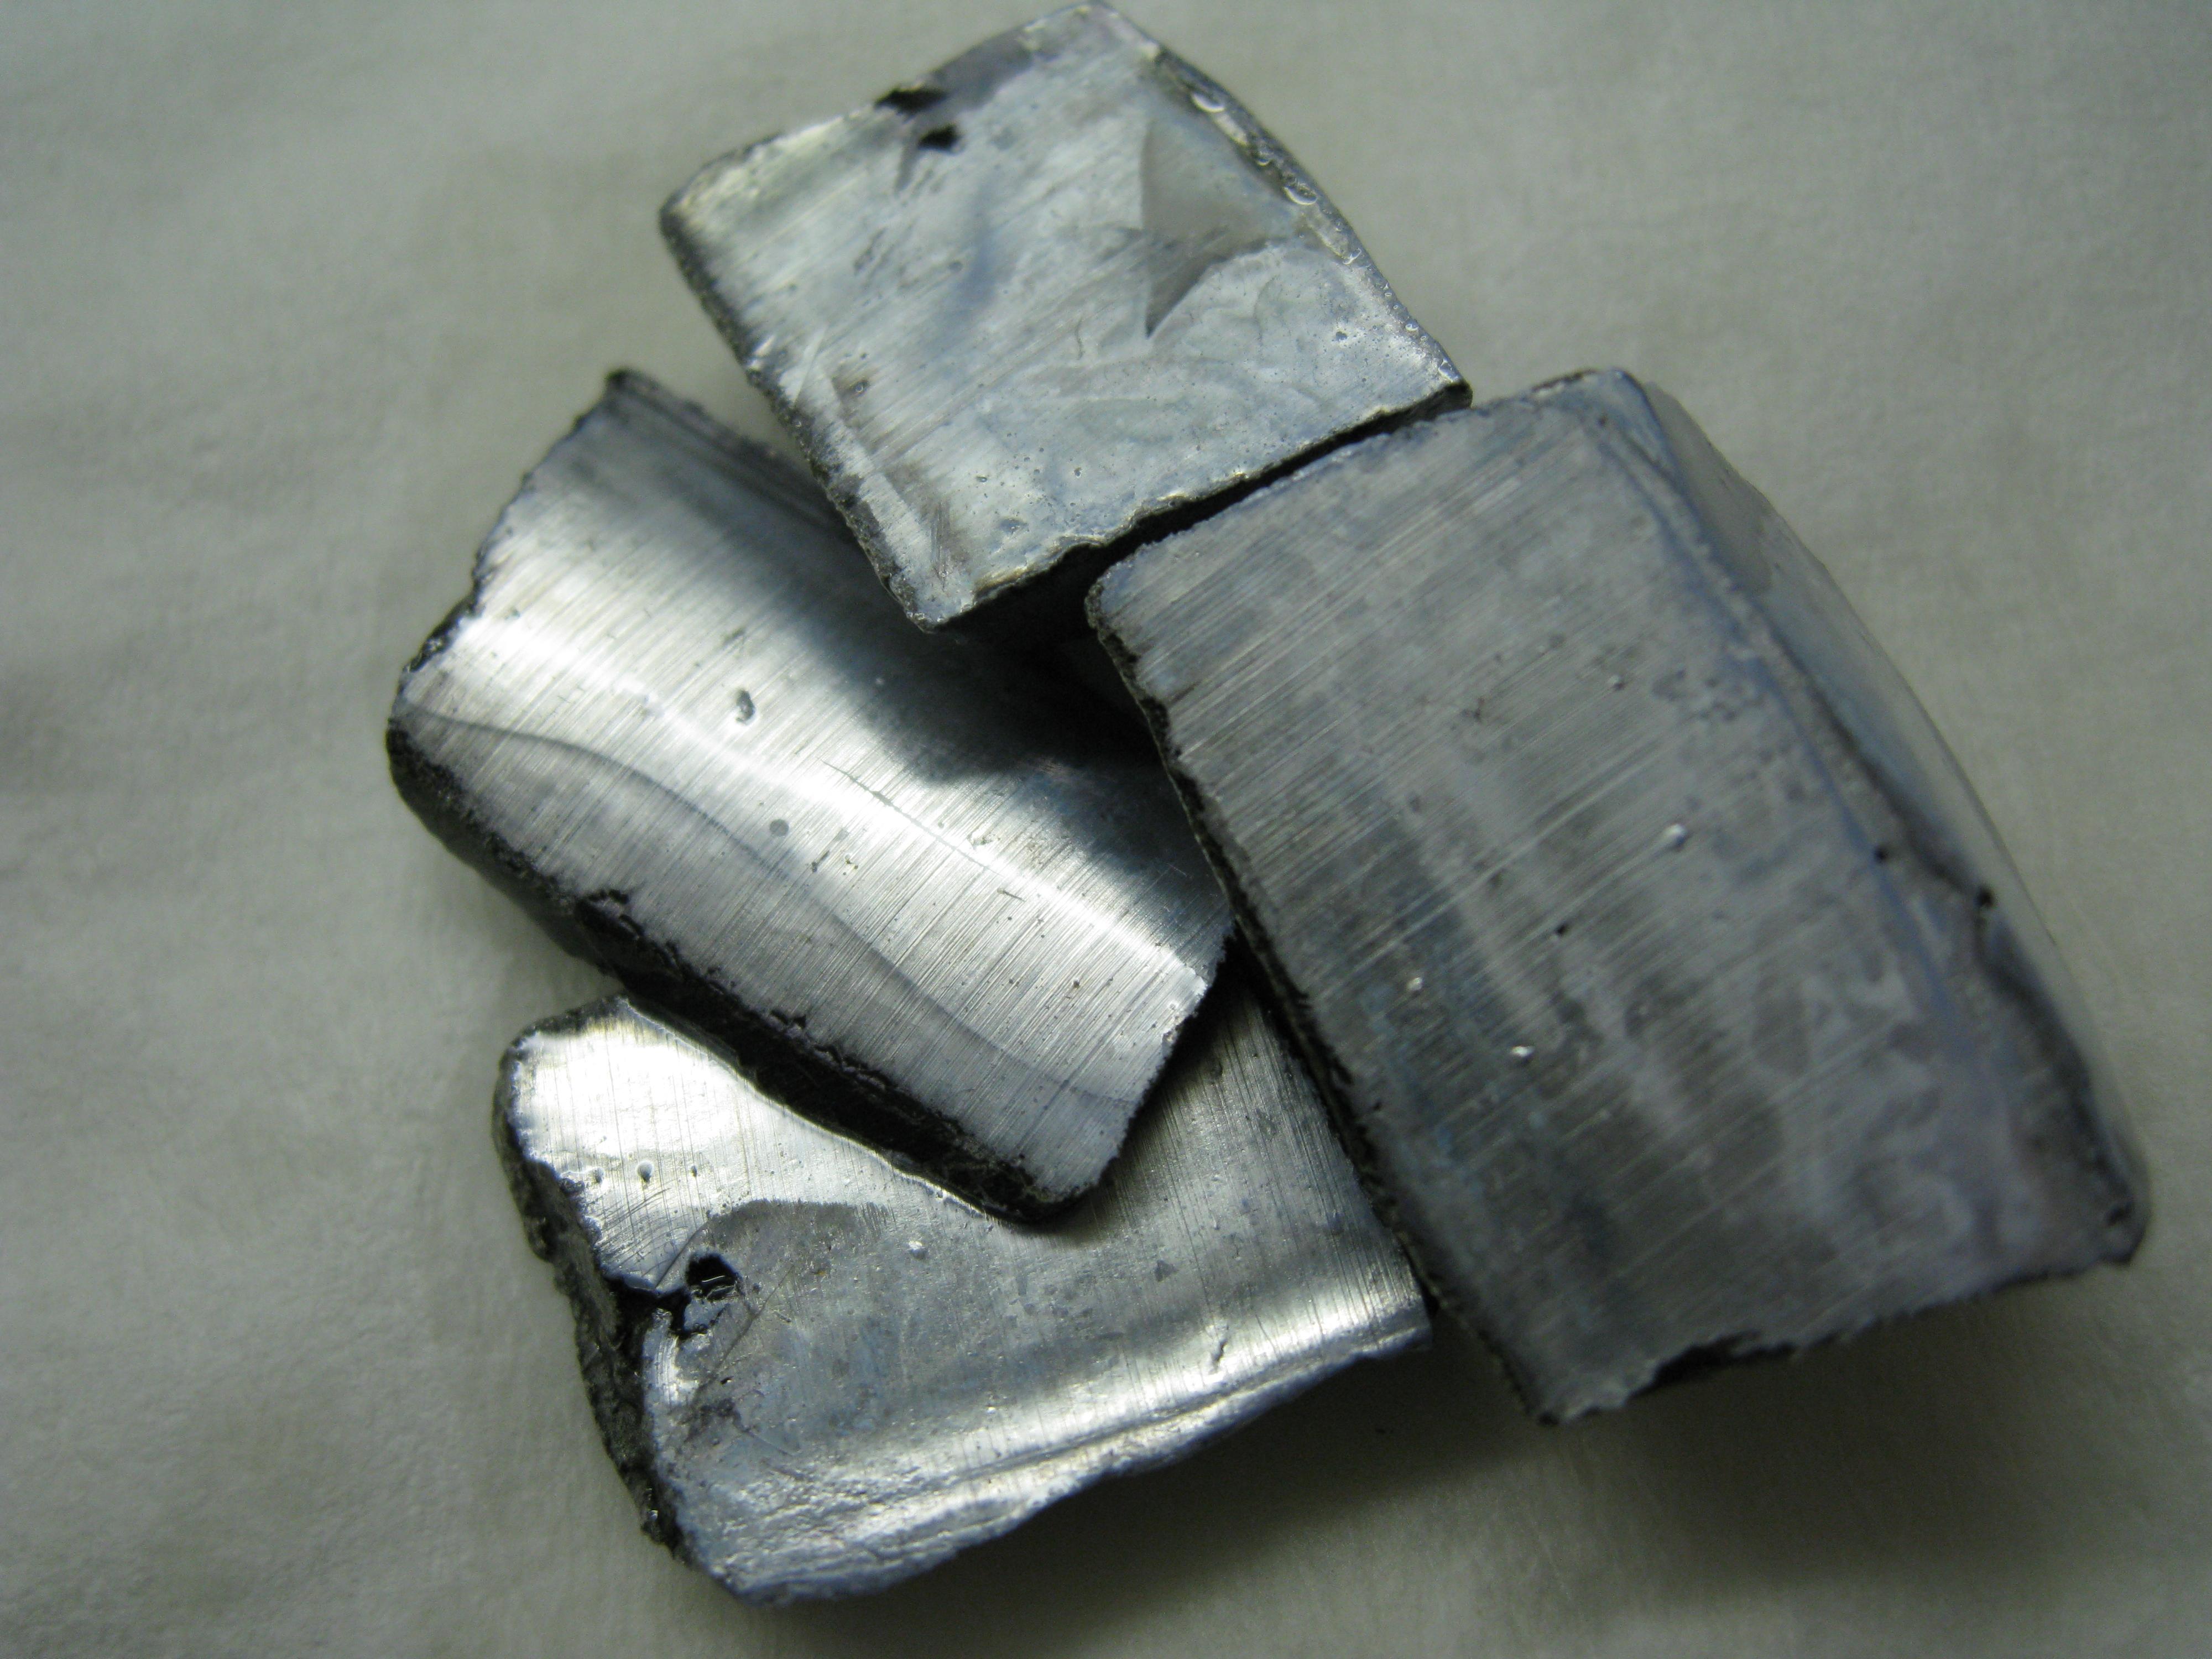 Blocks of dull colored metals.